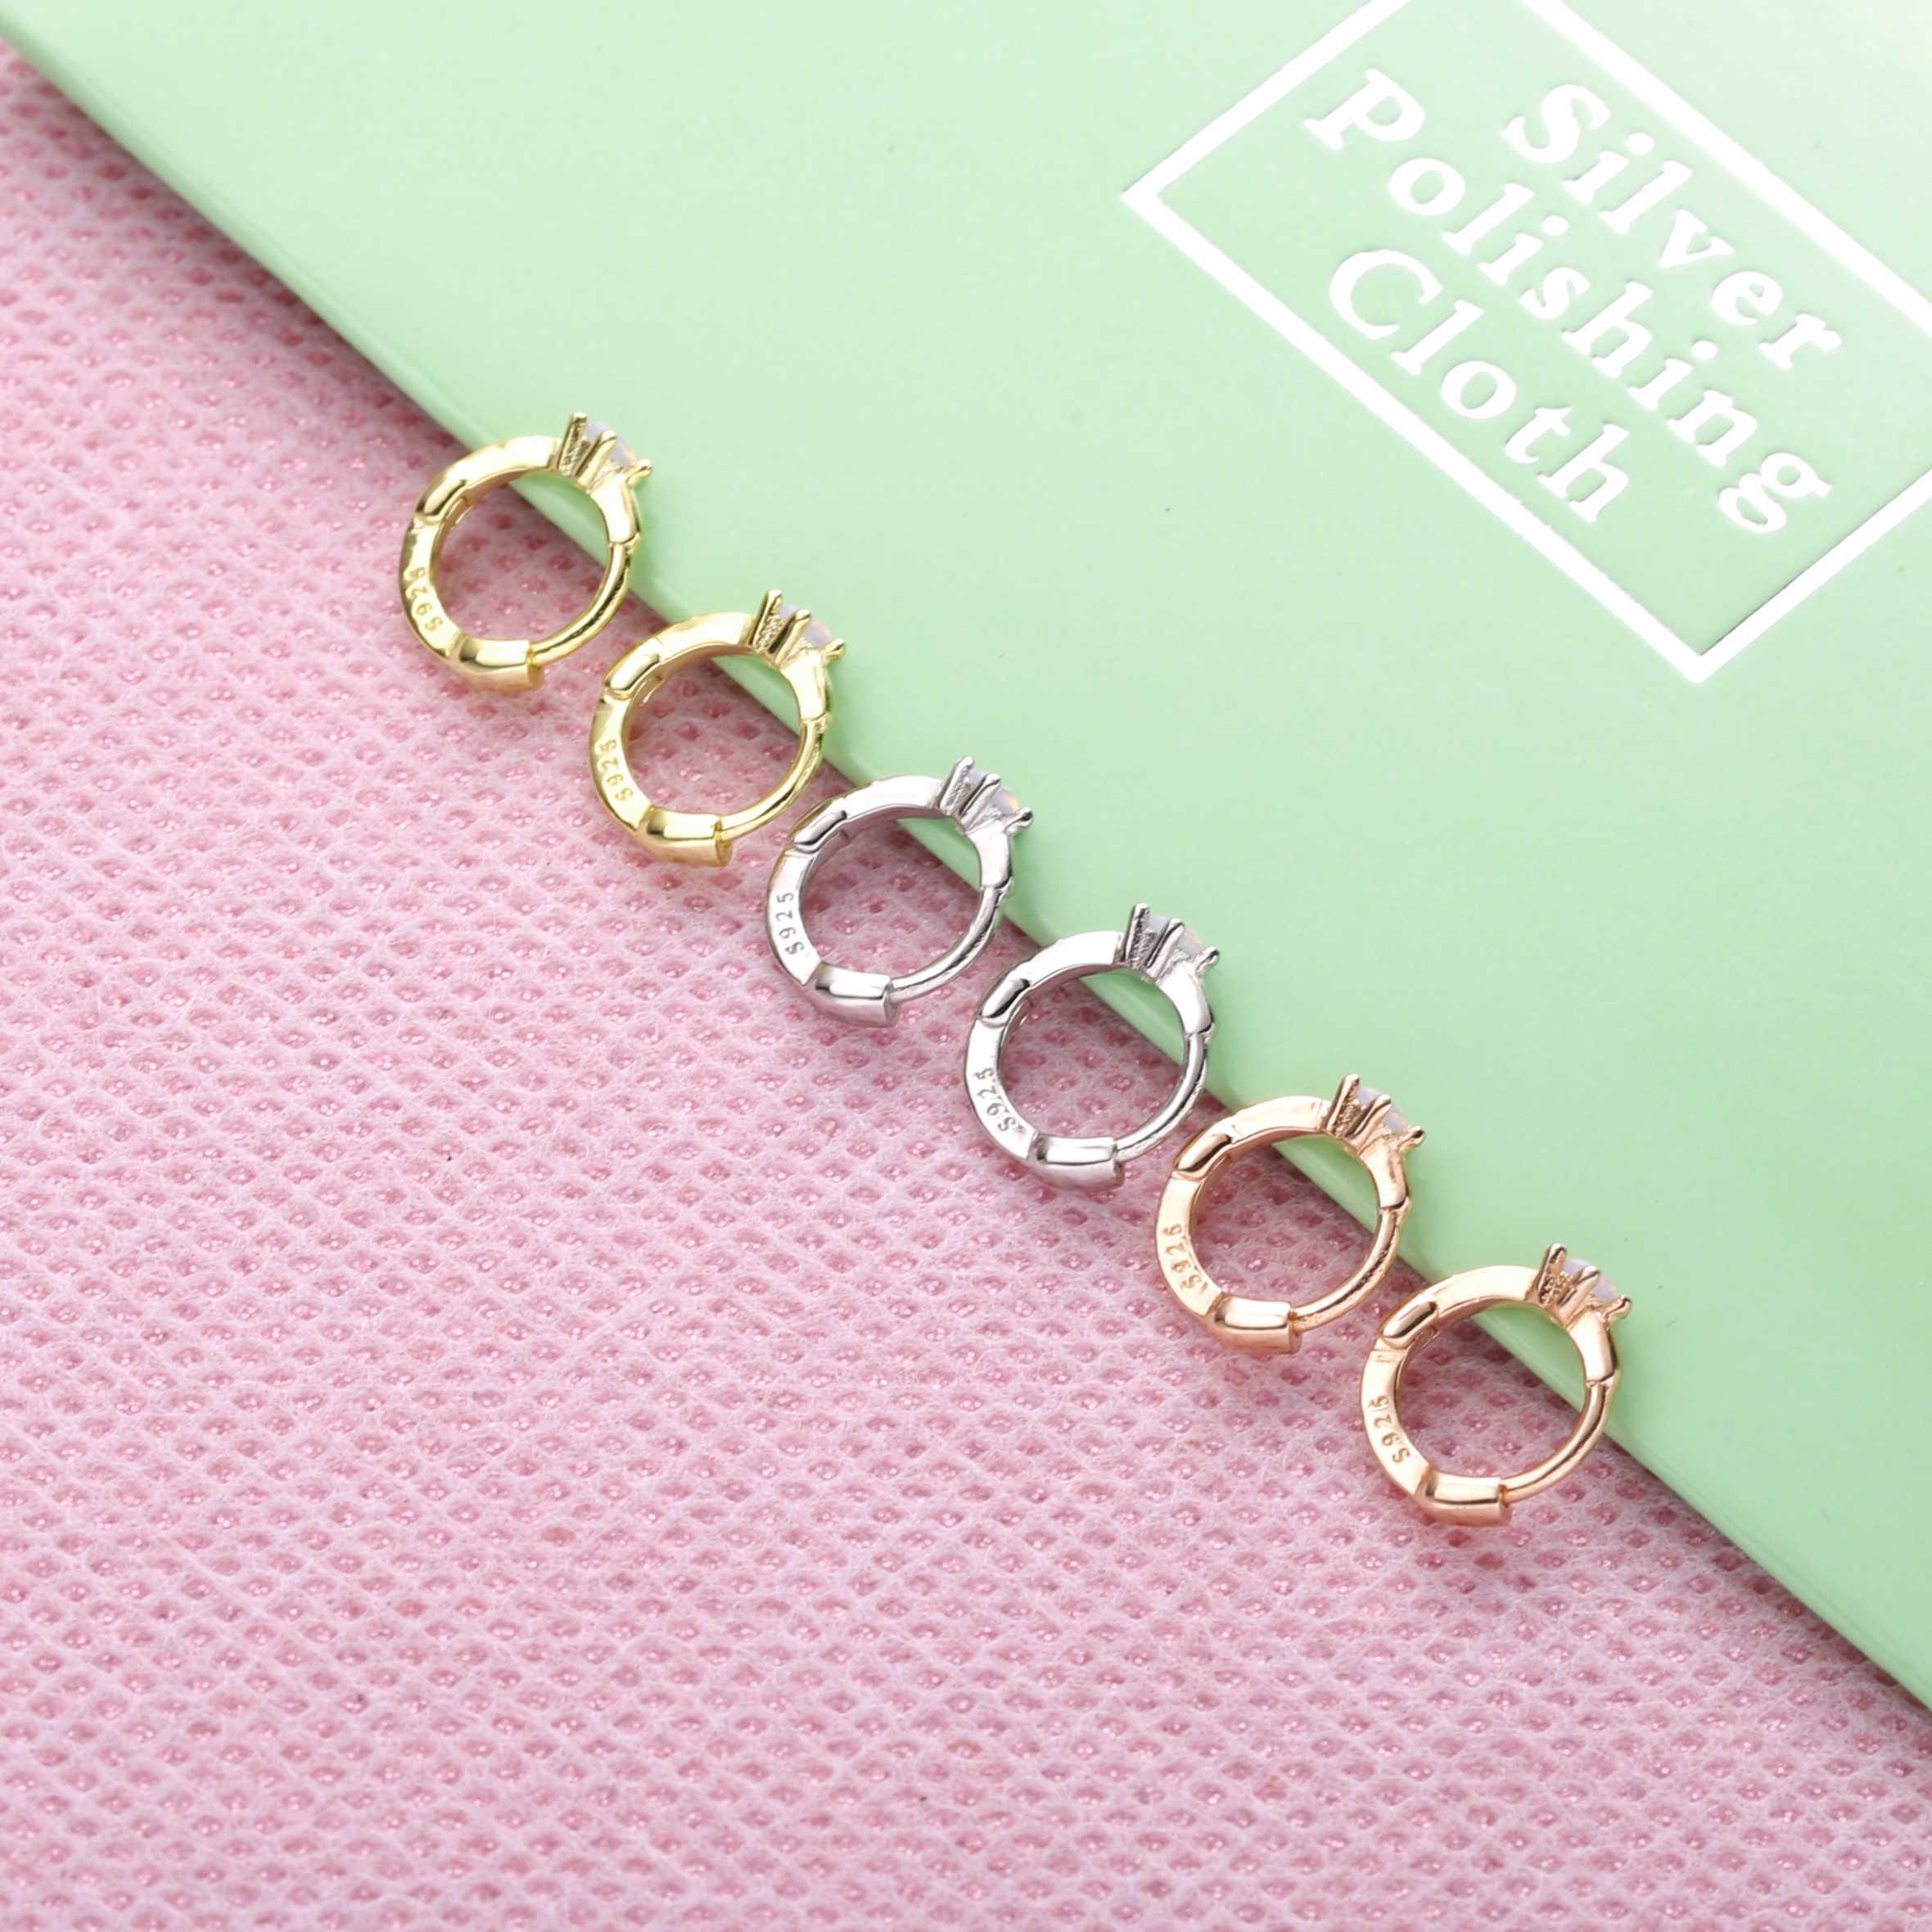 Slovecabin 925 Sterling Silver Baik Hoops Mini Lingkaran Lingkaran Wanita Anting-Anting Batu Opal Kristal Warna-warni Pelangi Zircon CZ Perhiasan